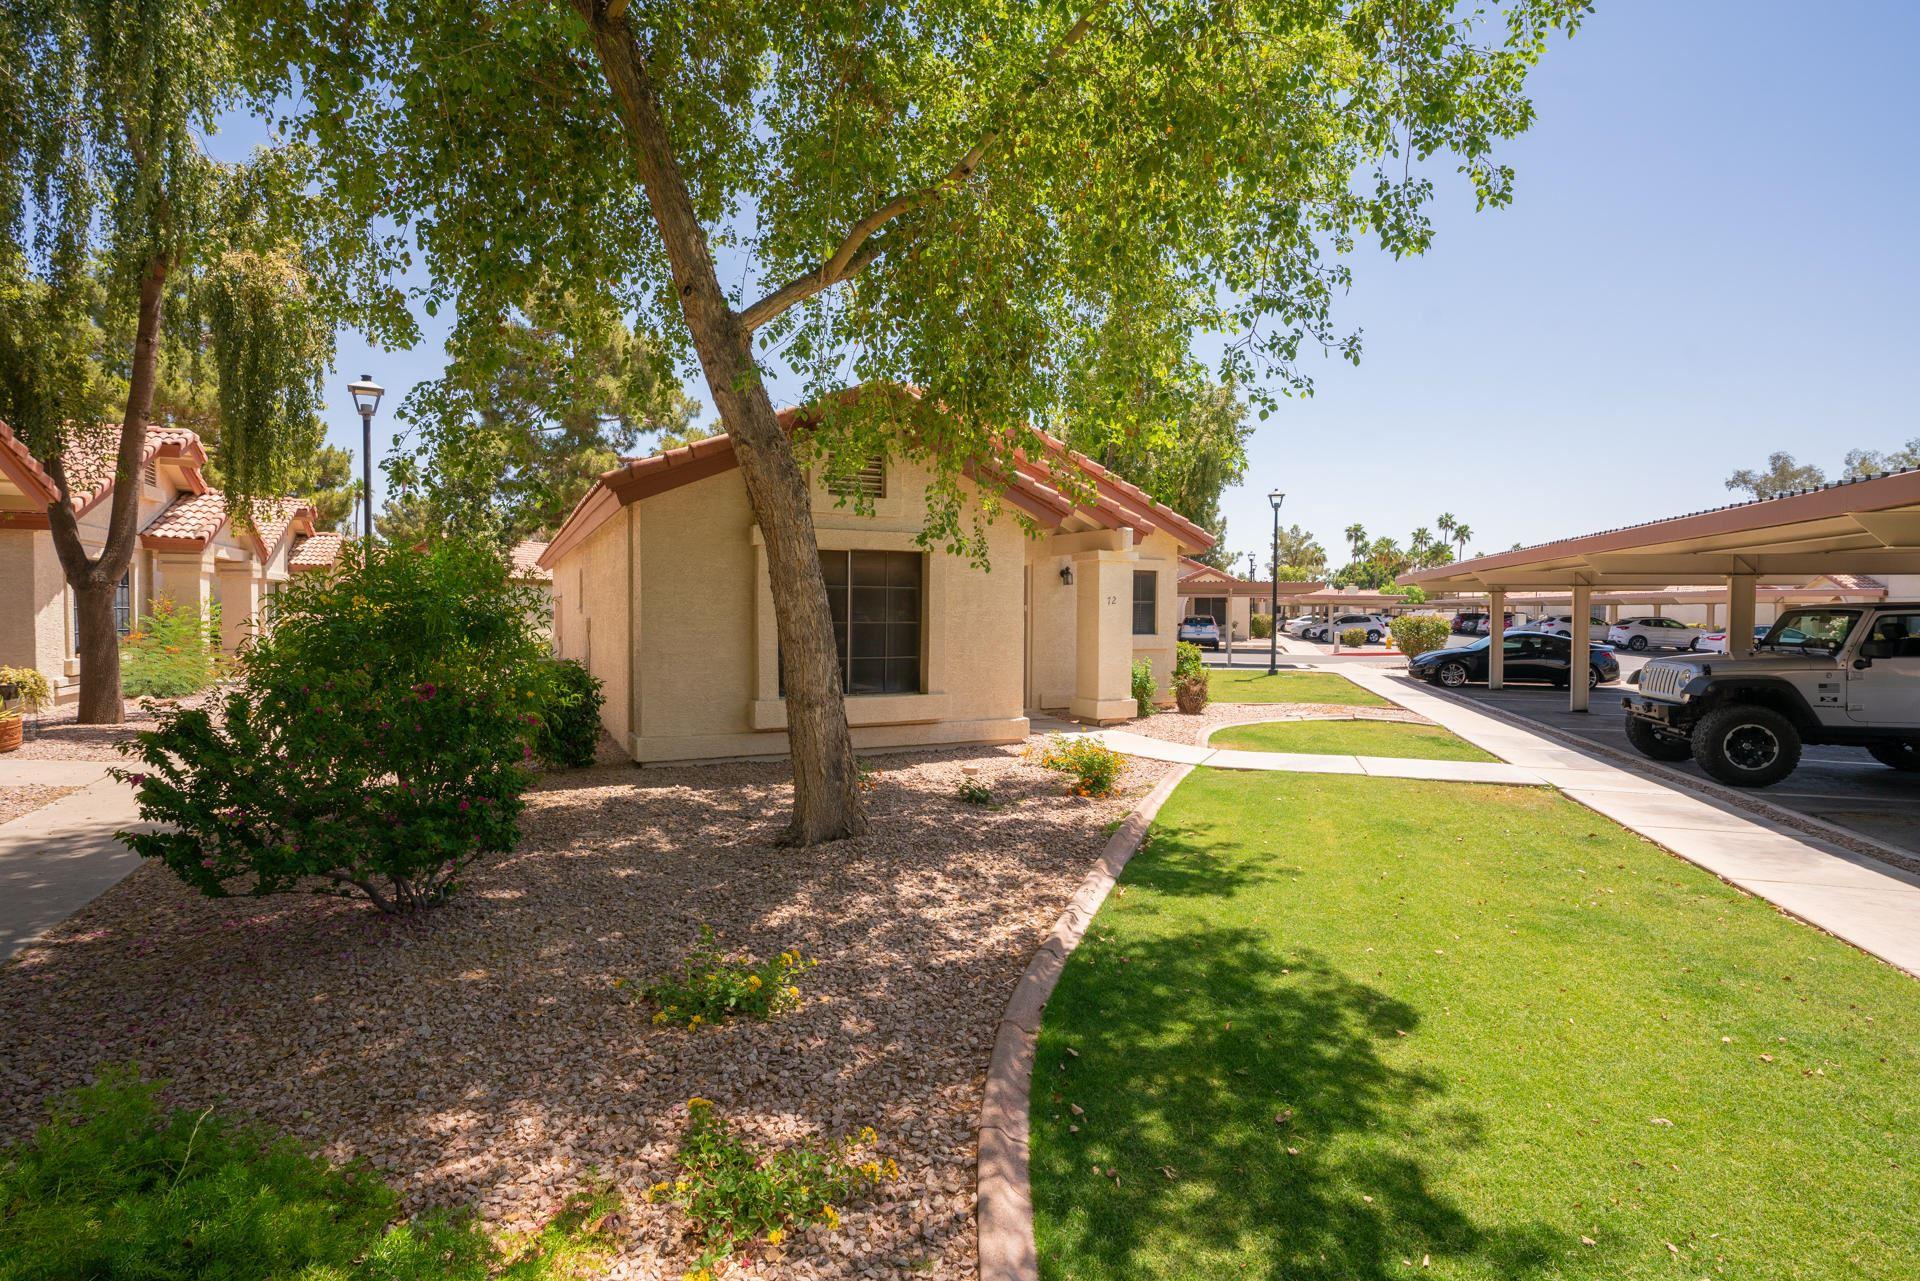 Photo of 1120 N VAL VISTA Drive #72, Gilbert, AZ 85234 (MLS # 6232518)